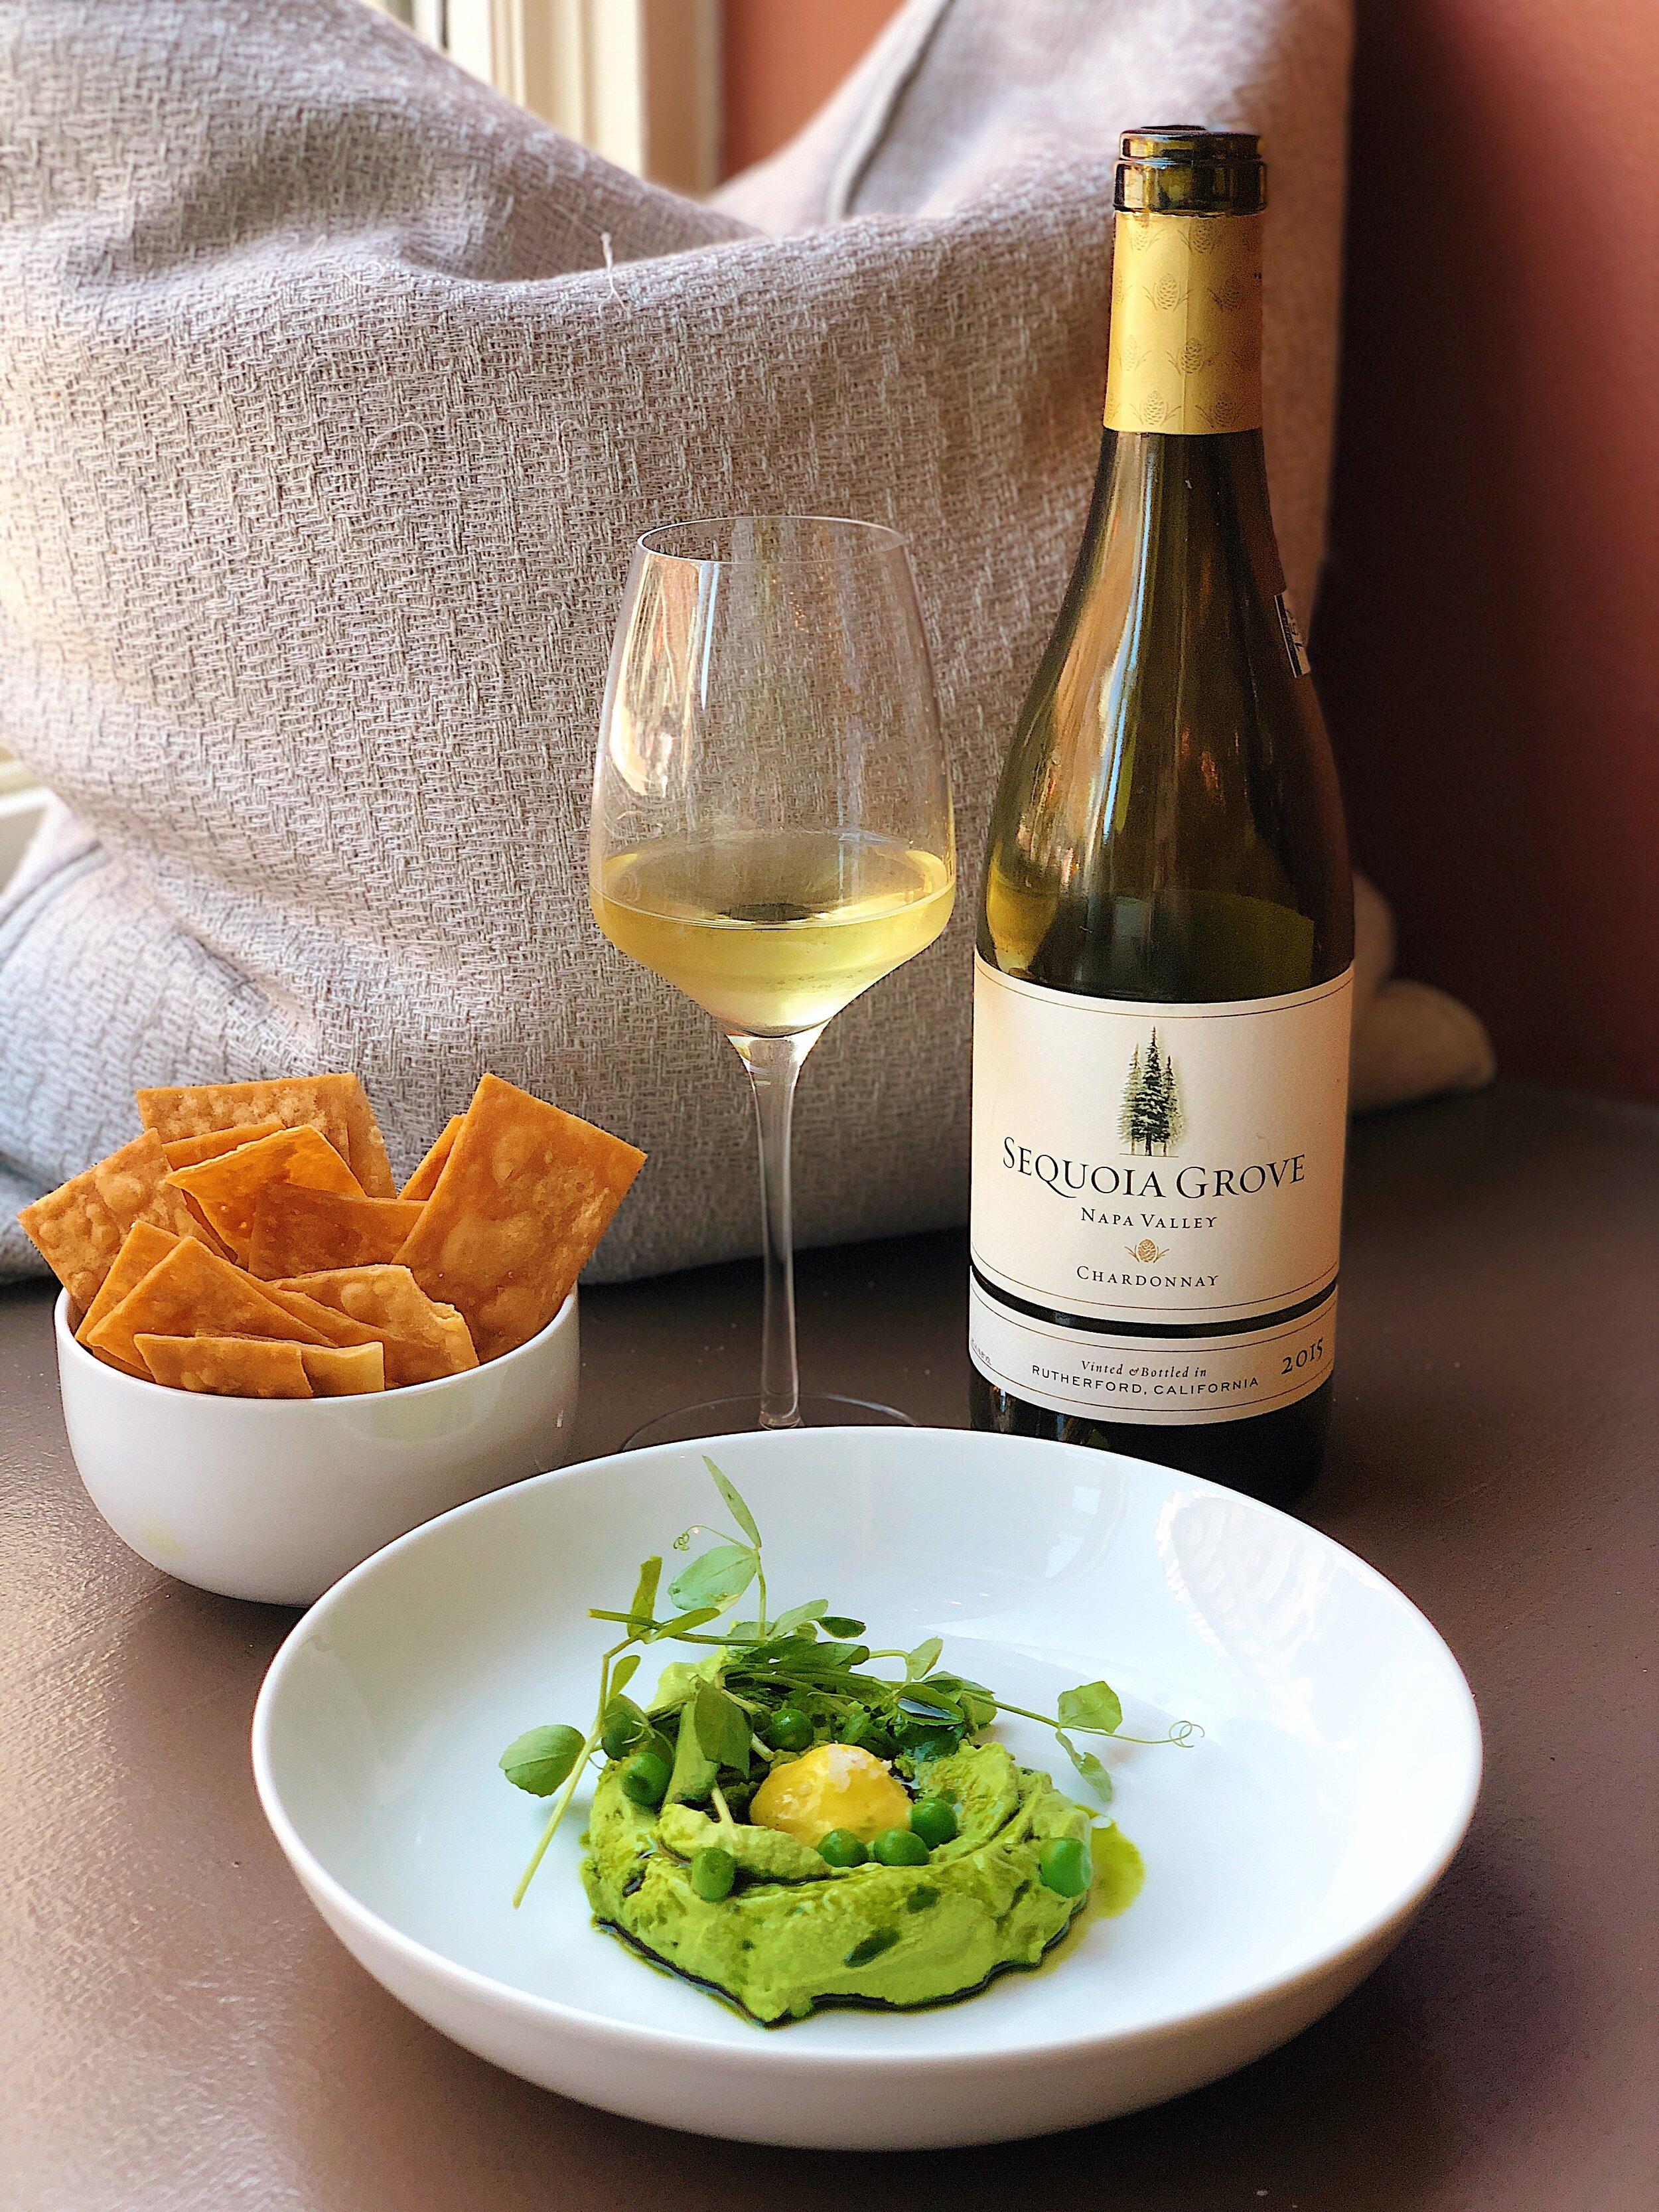 wine_wise_events_walk_food_portland_maine_chardonnay_Napa_sur_lieIMG_9407.JPG